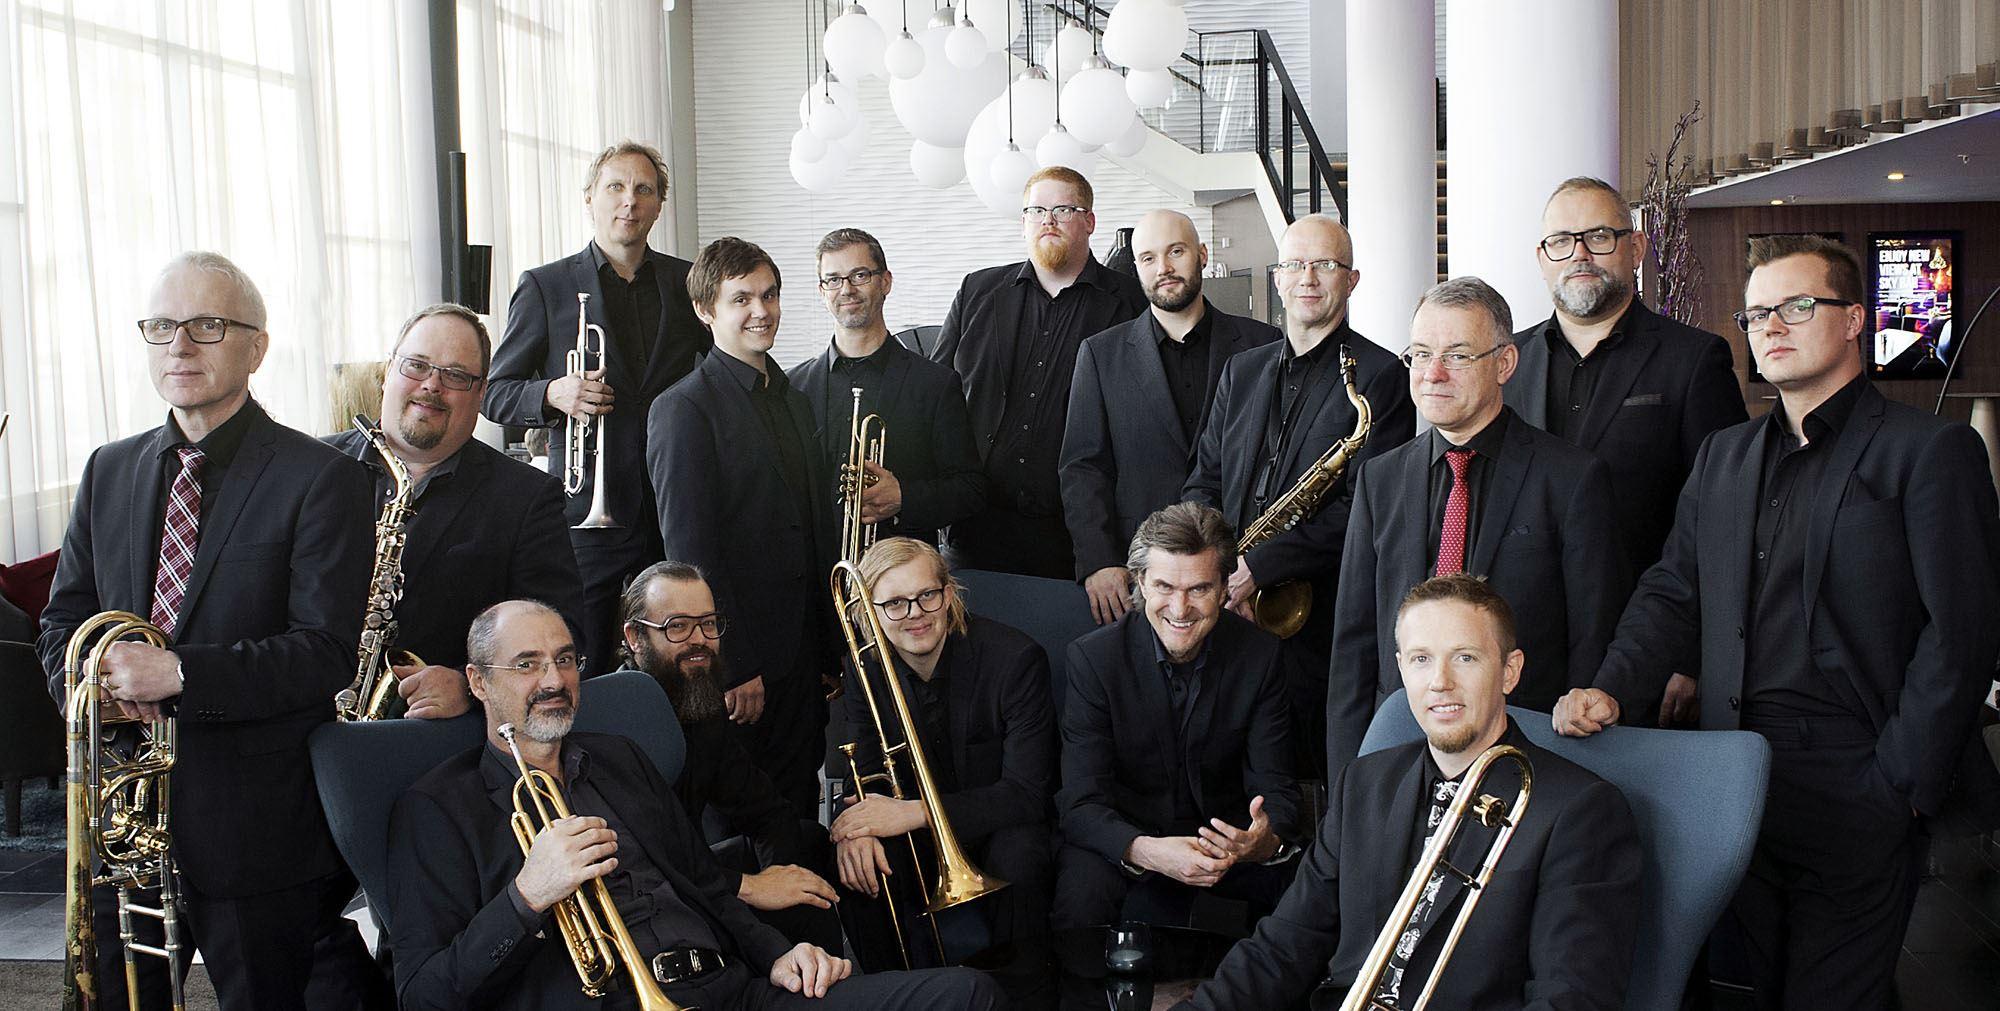 Emil och Pippi, Norrbotten Big Band with Sara Riedel - Jazz i Jemtland